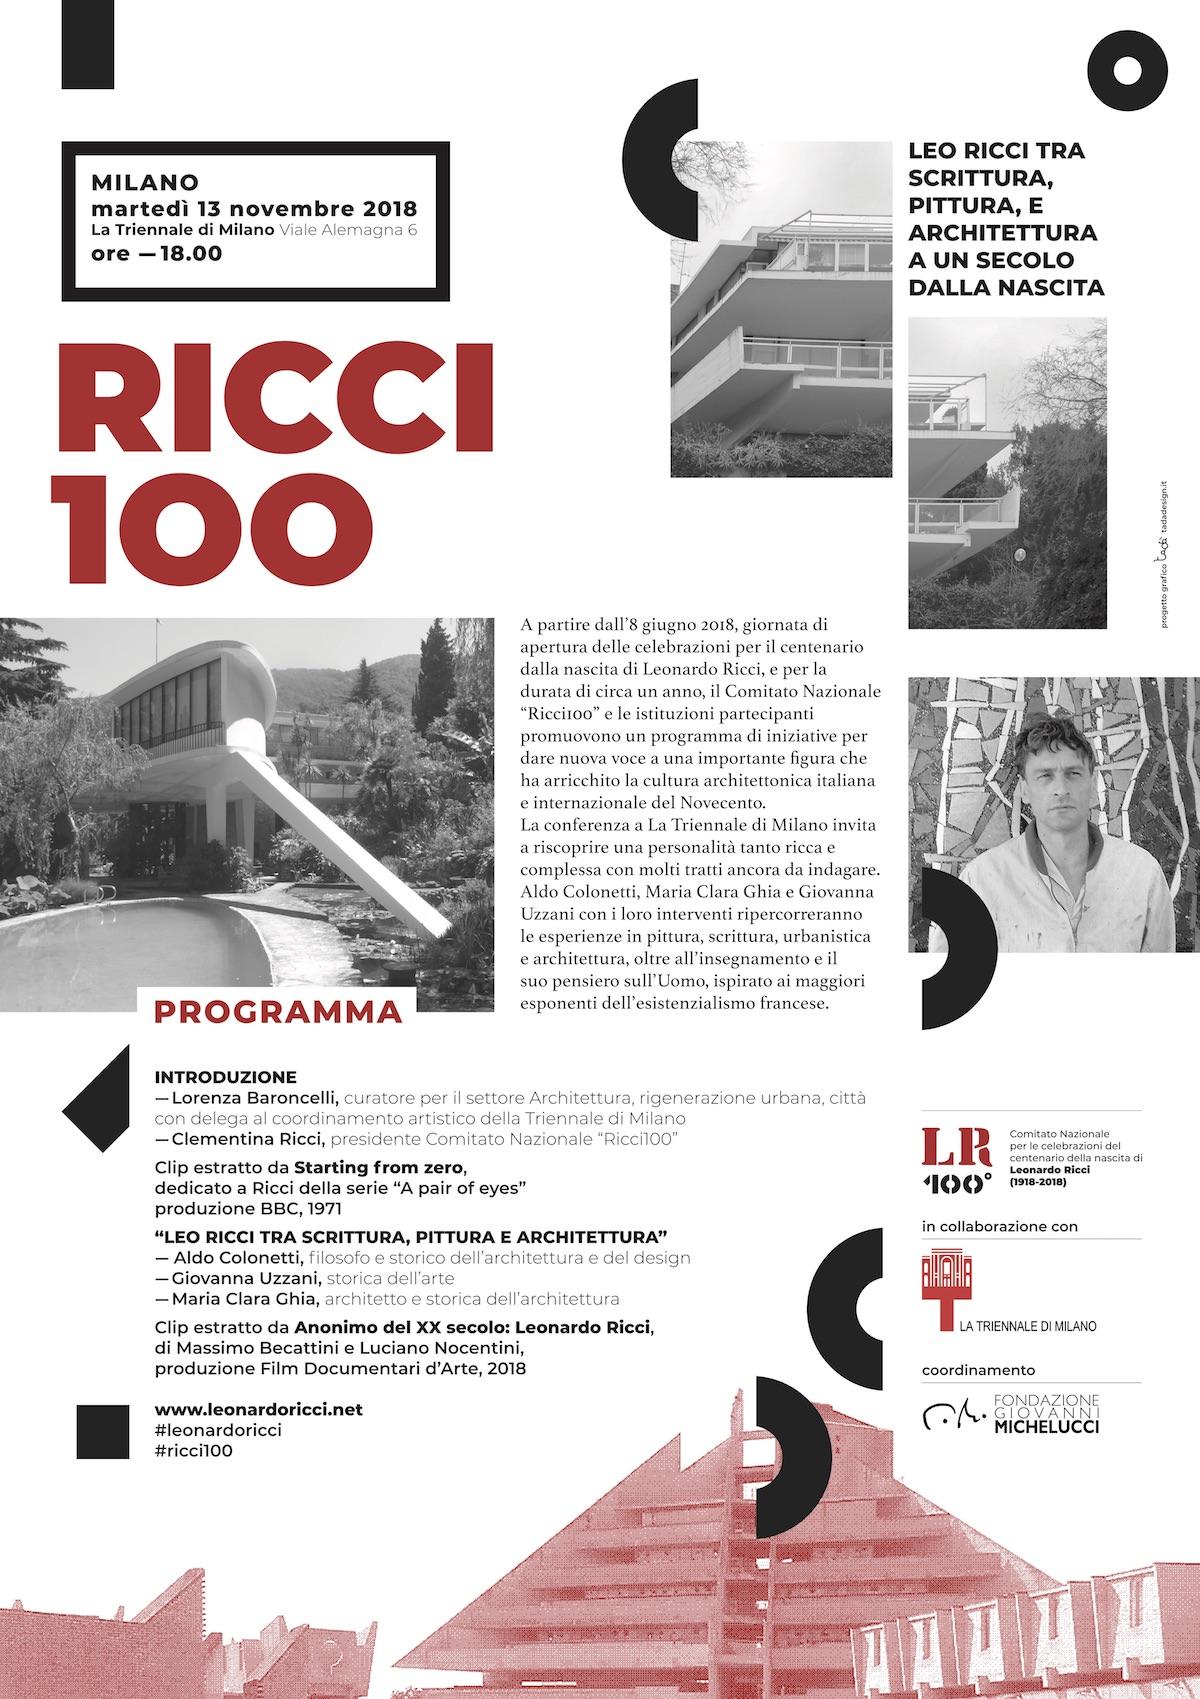 Ricci-100-Triennale-programma